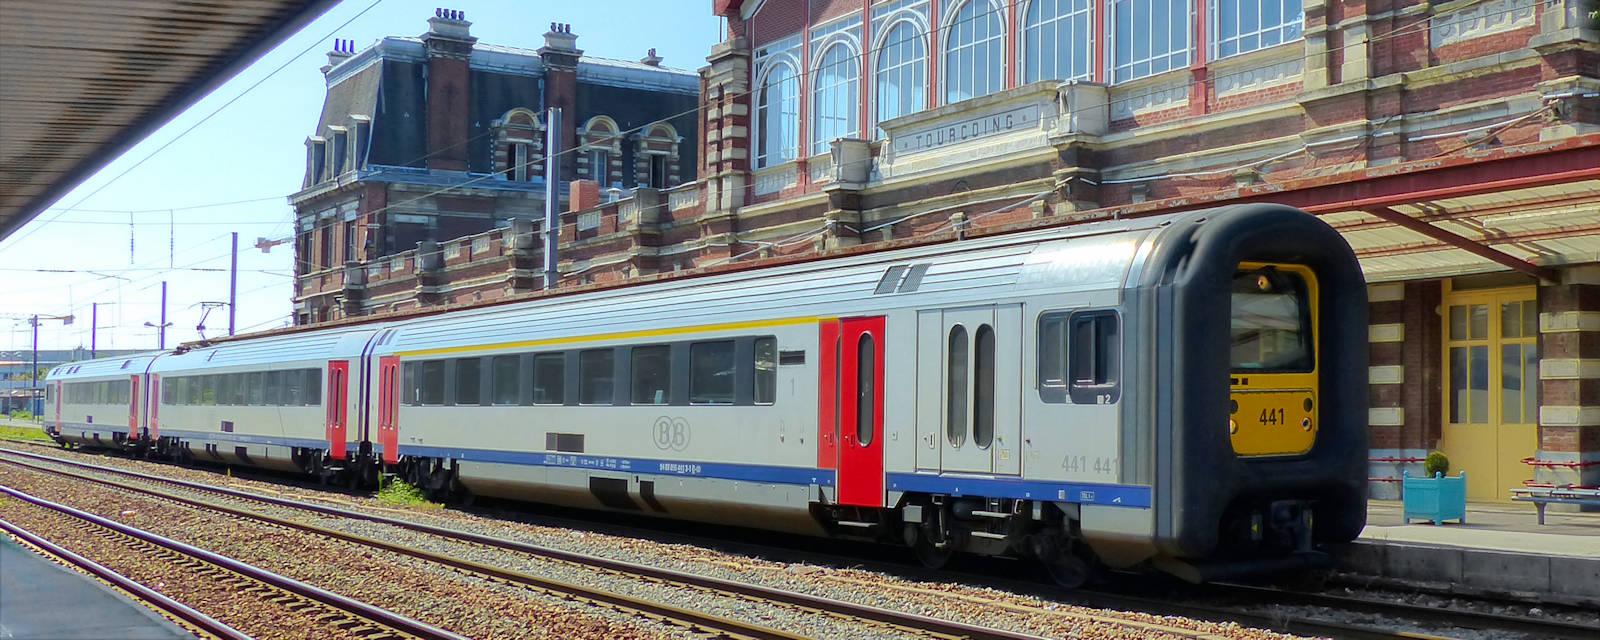 Gare de Tourcoing - Train Express Régional à quai